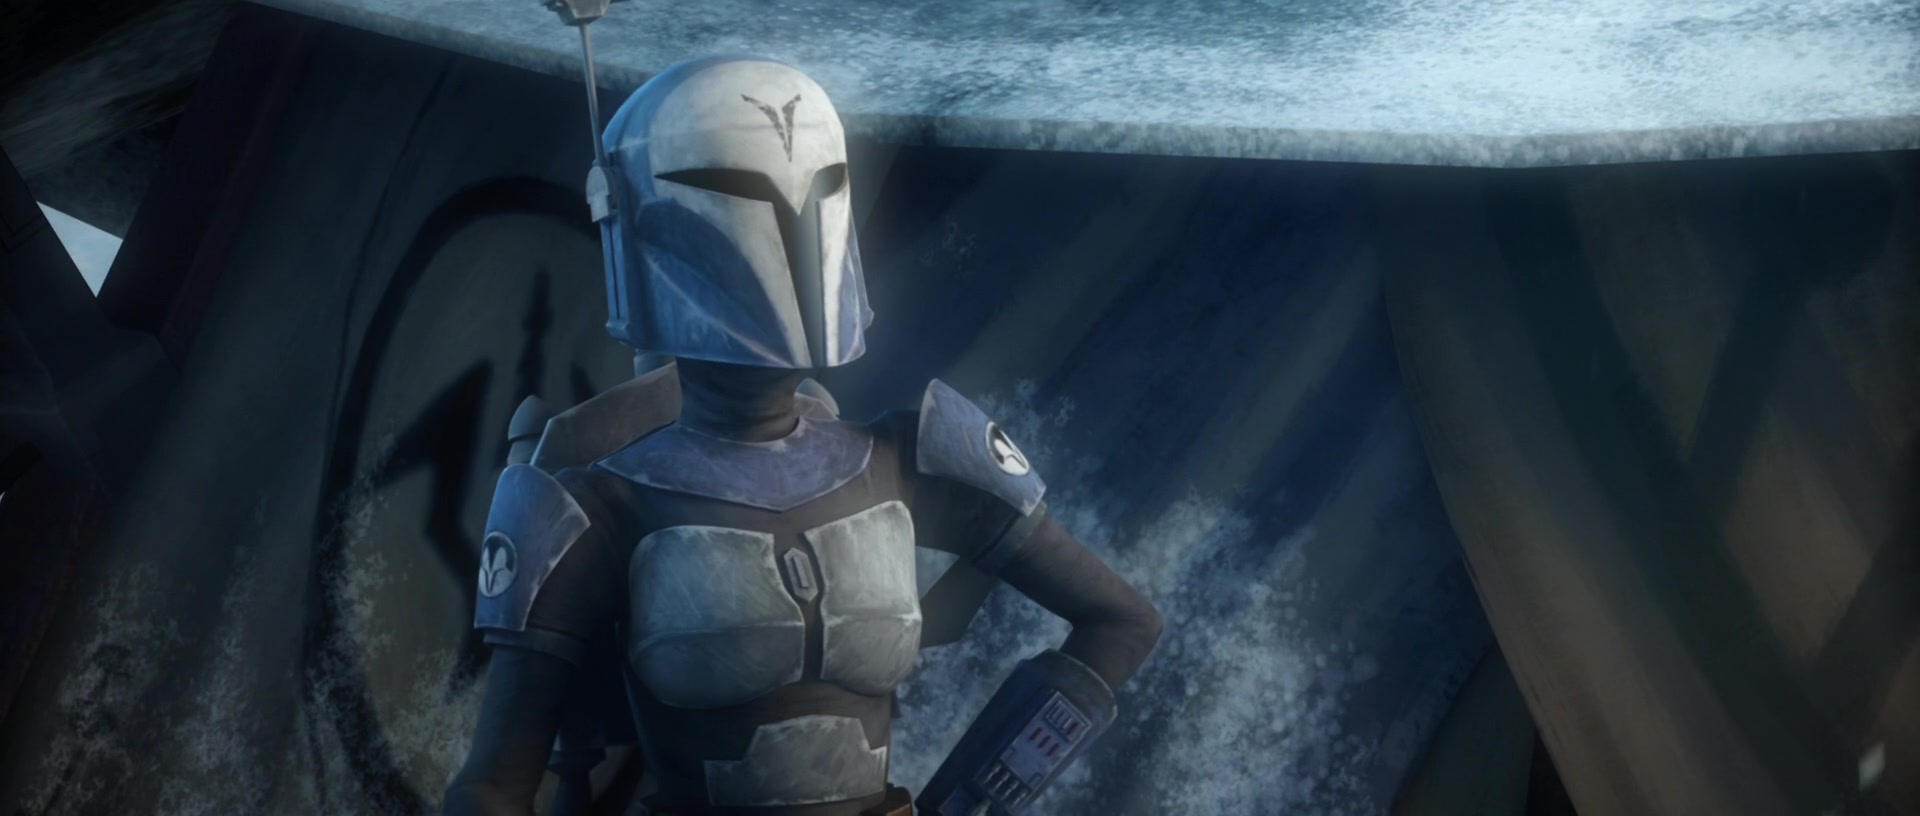 star wars series the clone wars s4e14 a friend in need bo-katan kryze